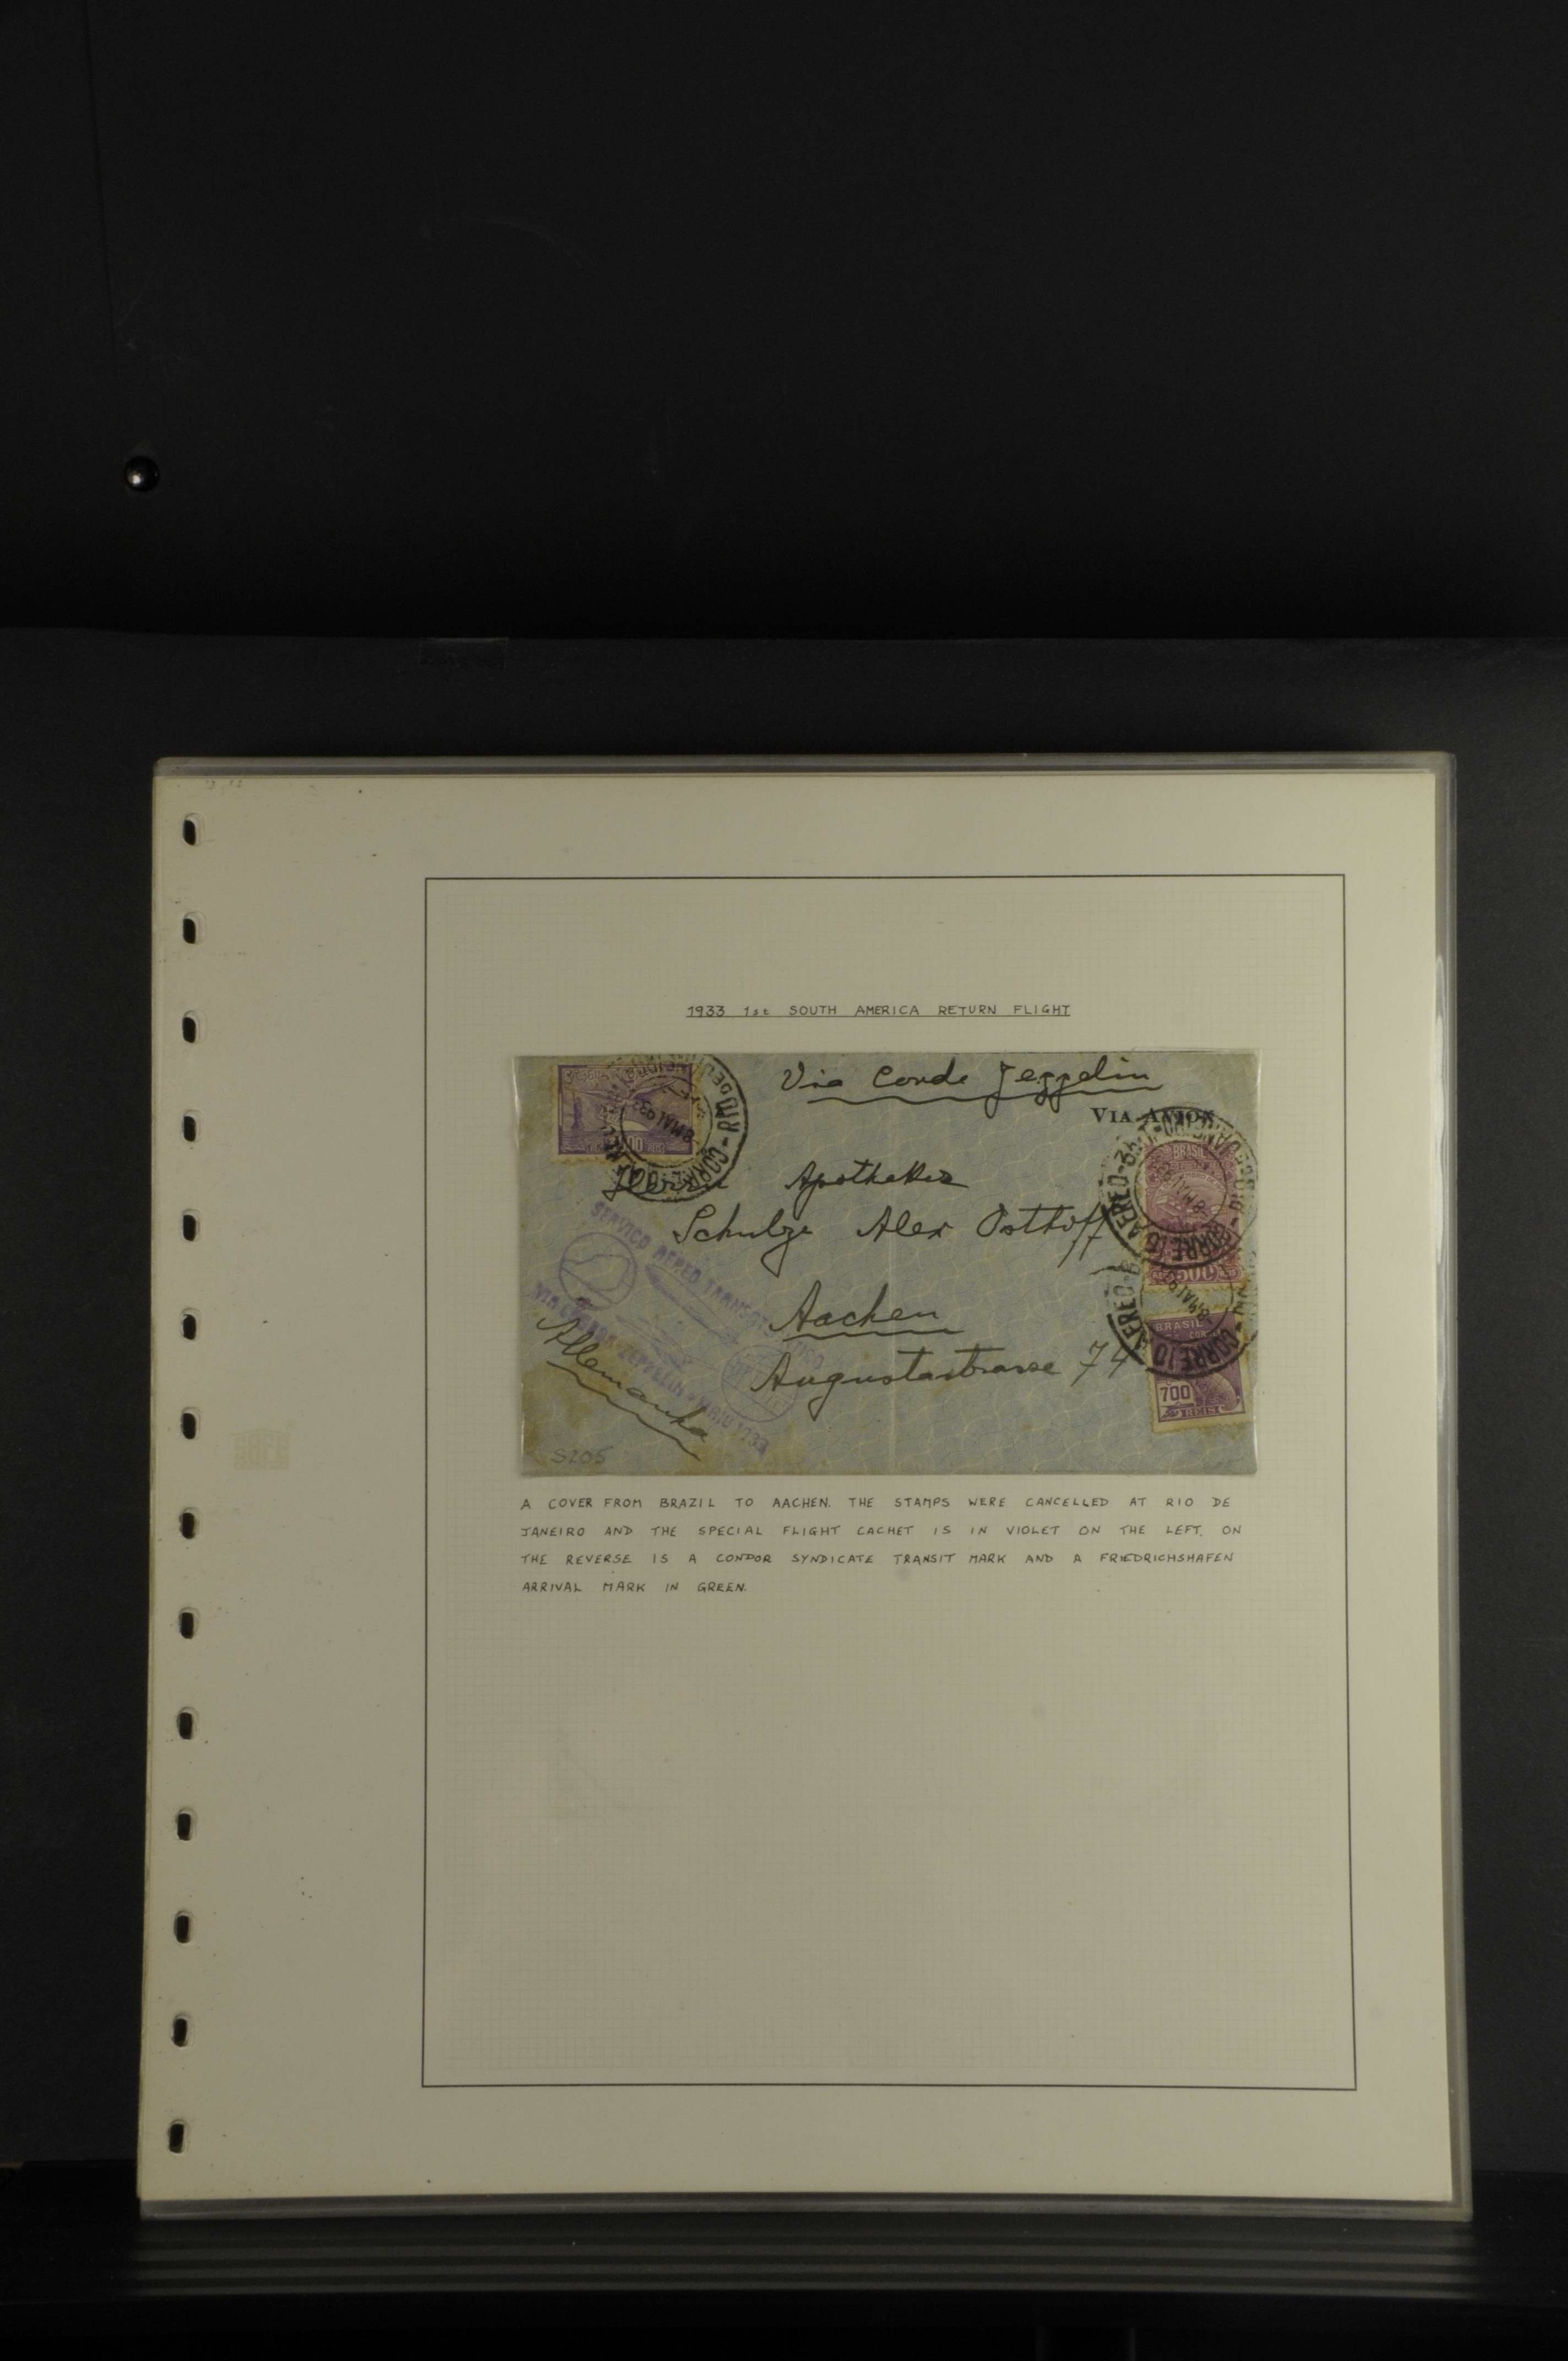 Lot 7650 - Flug- und Zeppelinpost zeppelinpost -  Auktionshaus Ulrich Felzmann GmbH & Co. KG Auction #161 Philatelic & Numismatic